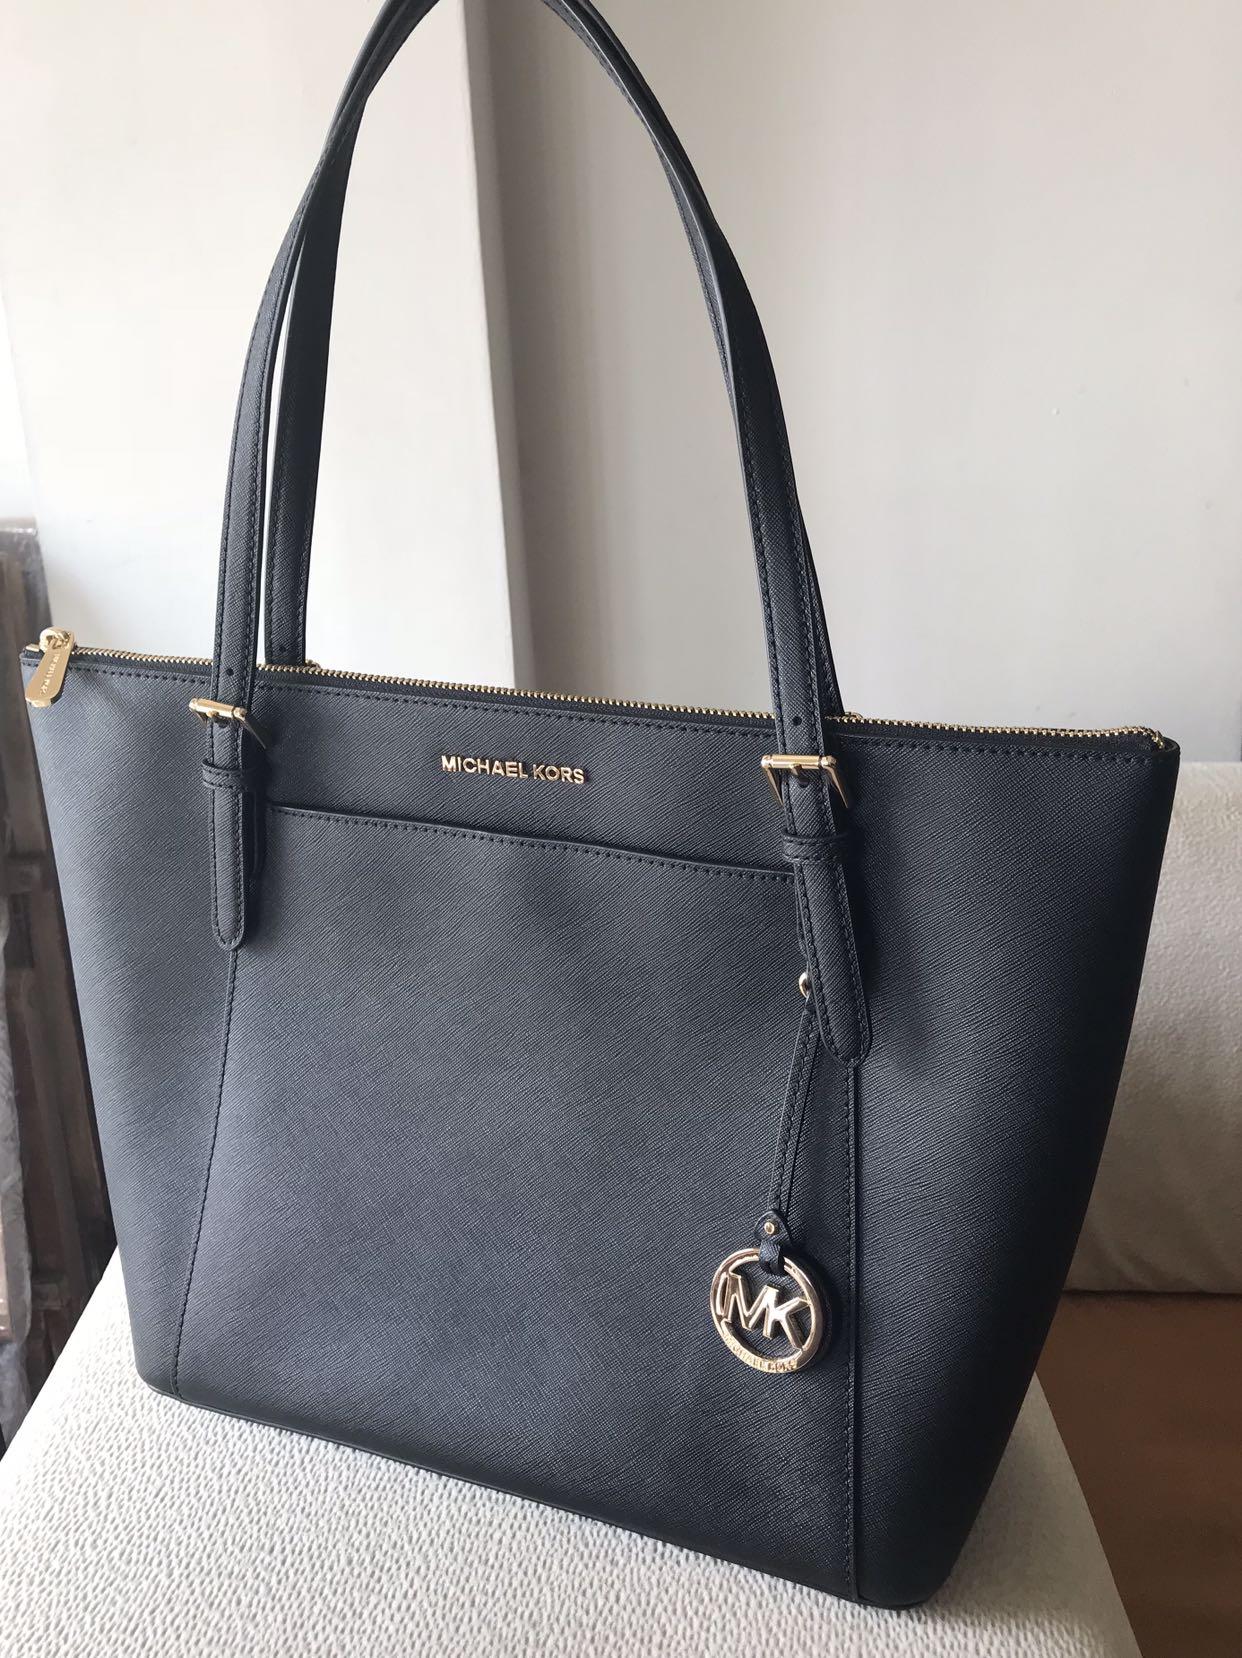 22ab370cd Michael Kors Tote Bag (Ciara Top Zip Black), Women's Fashion, Bags &  Wallets, Handbags on Carousell